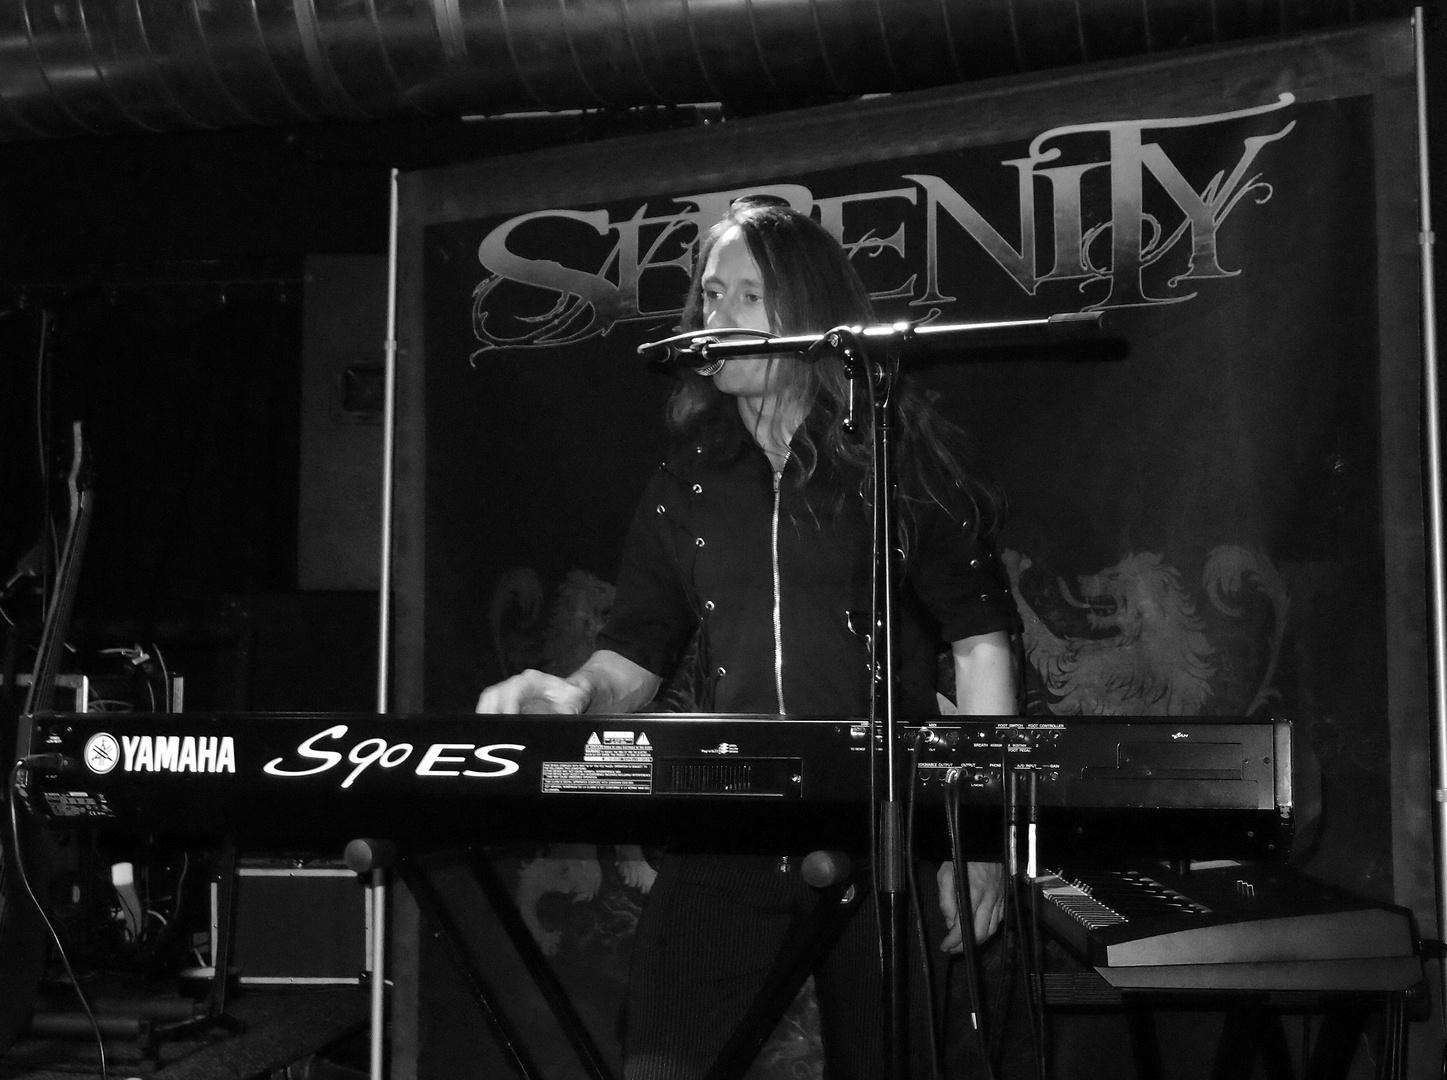 Serenity III